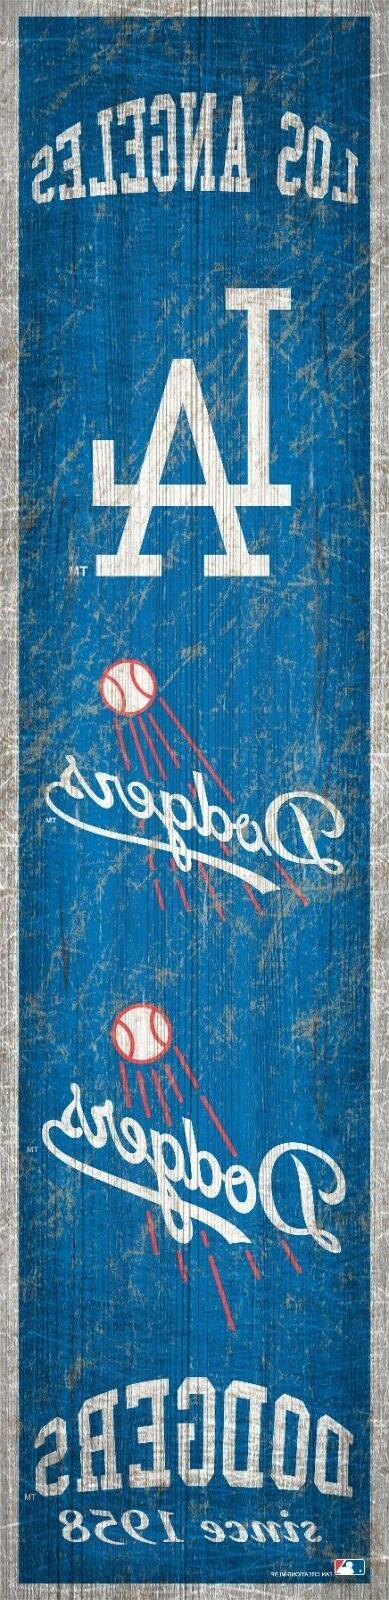 los angeles dodgers heritage banner retro logo